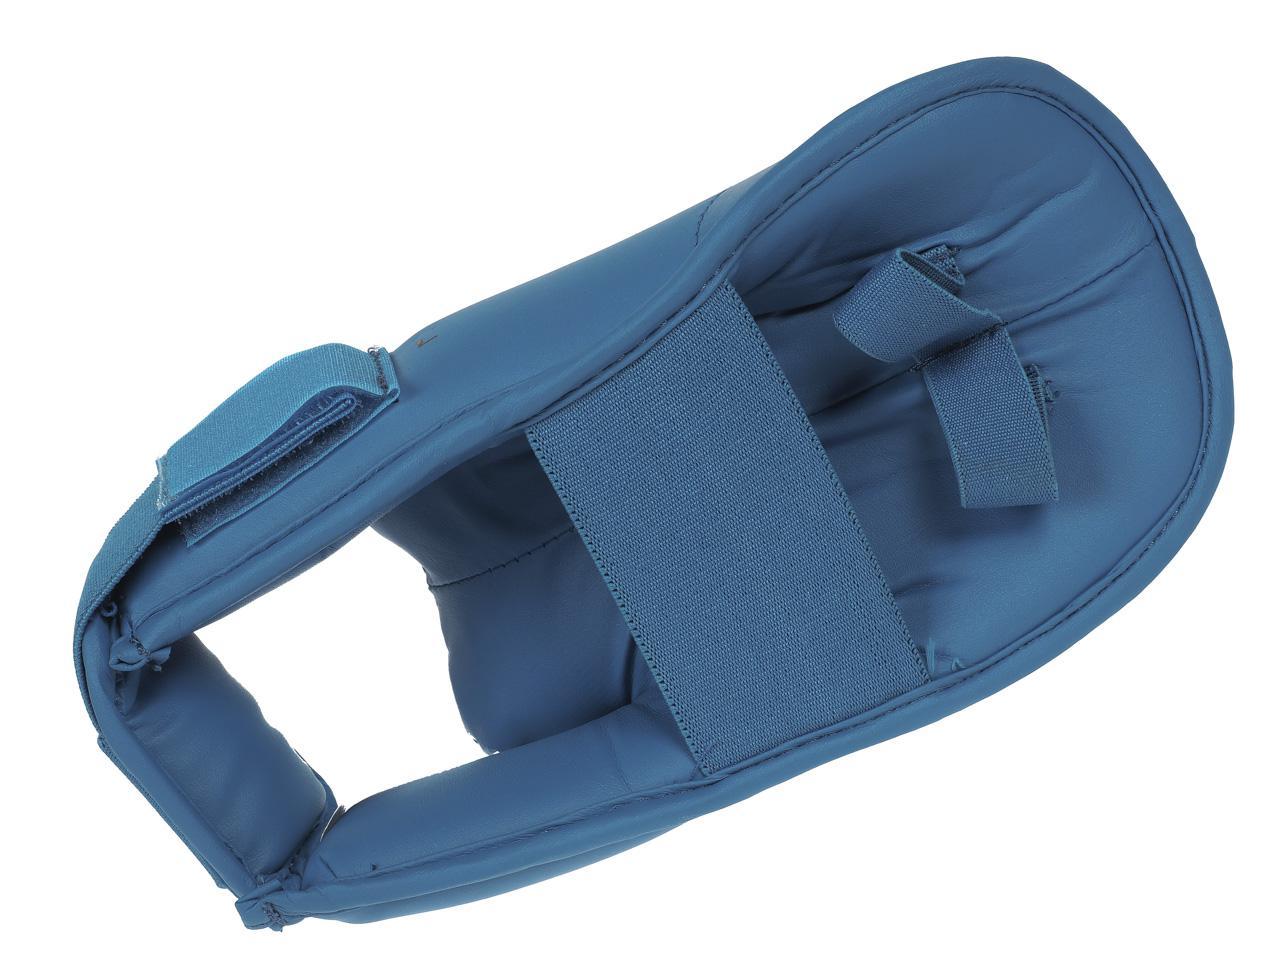 Protects-Feet-Karate-Adidas-Protege-Feet-Blue-Karate-Blue-58599-New thumbnail 4